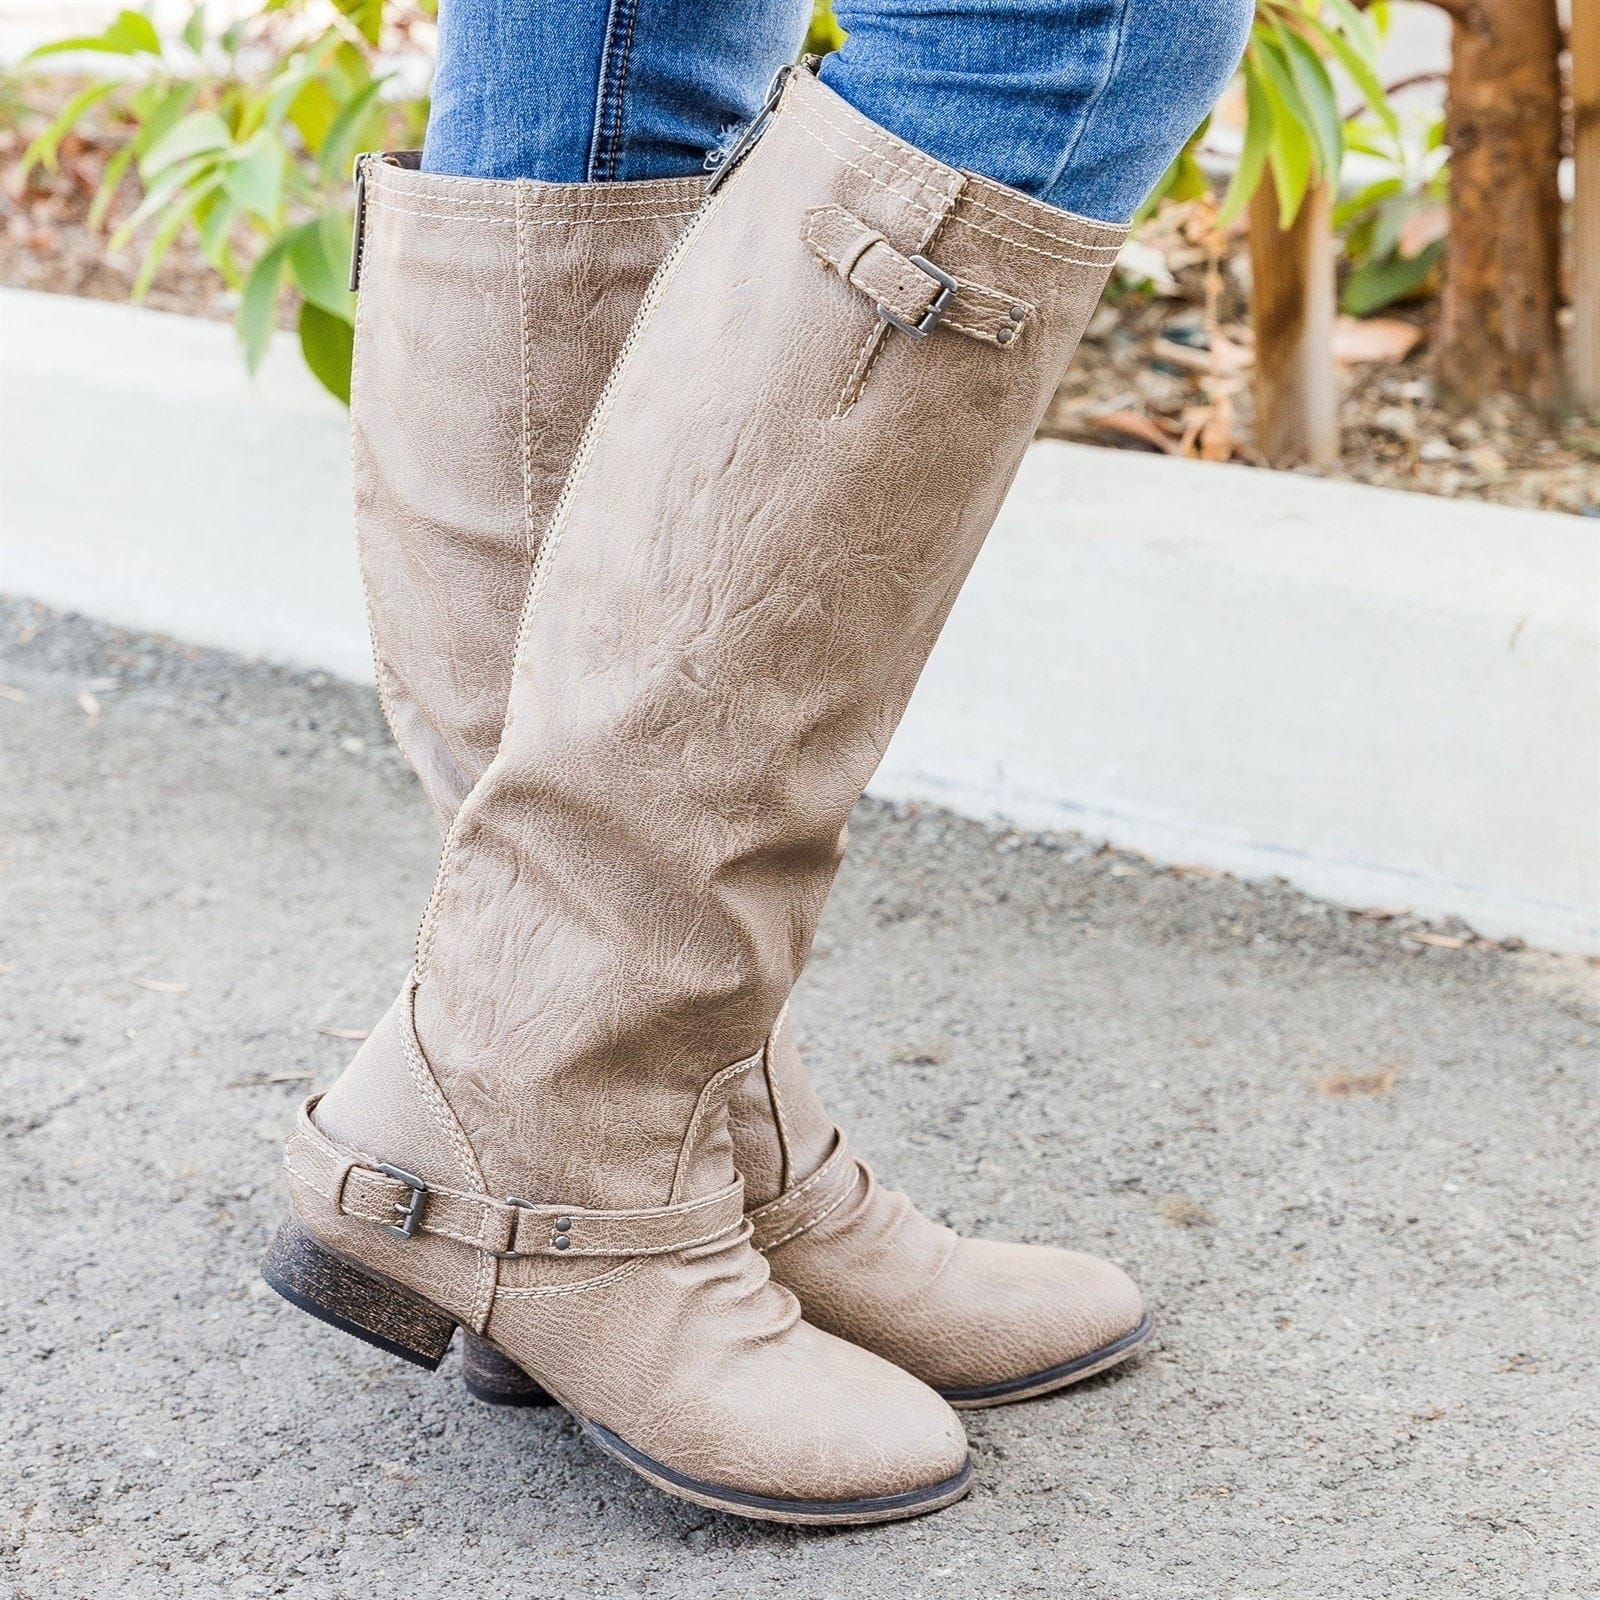 5915d77b7f9 Scrunch Riding Boots Clearance